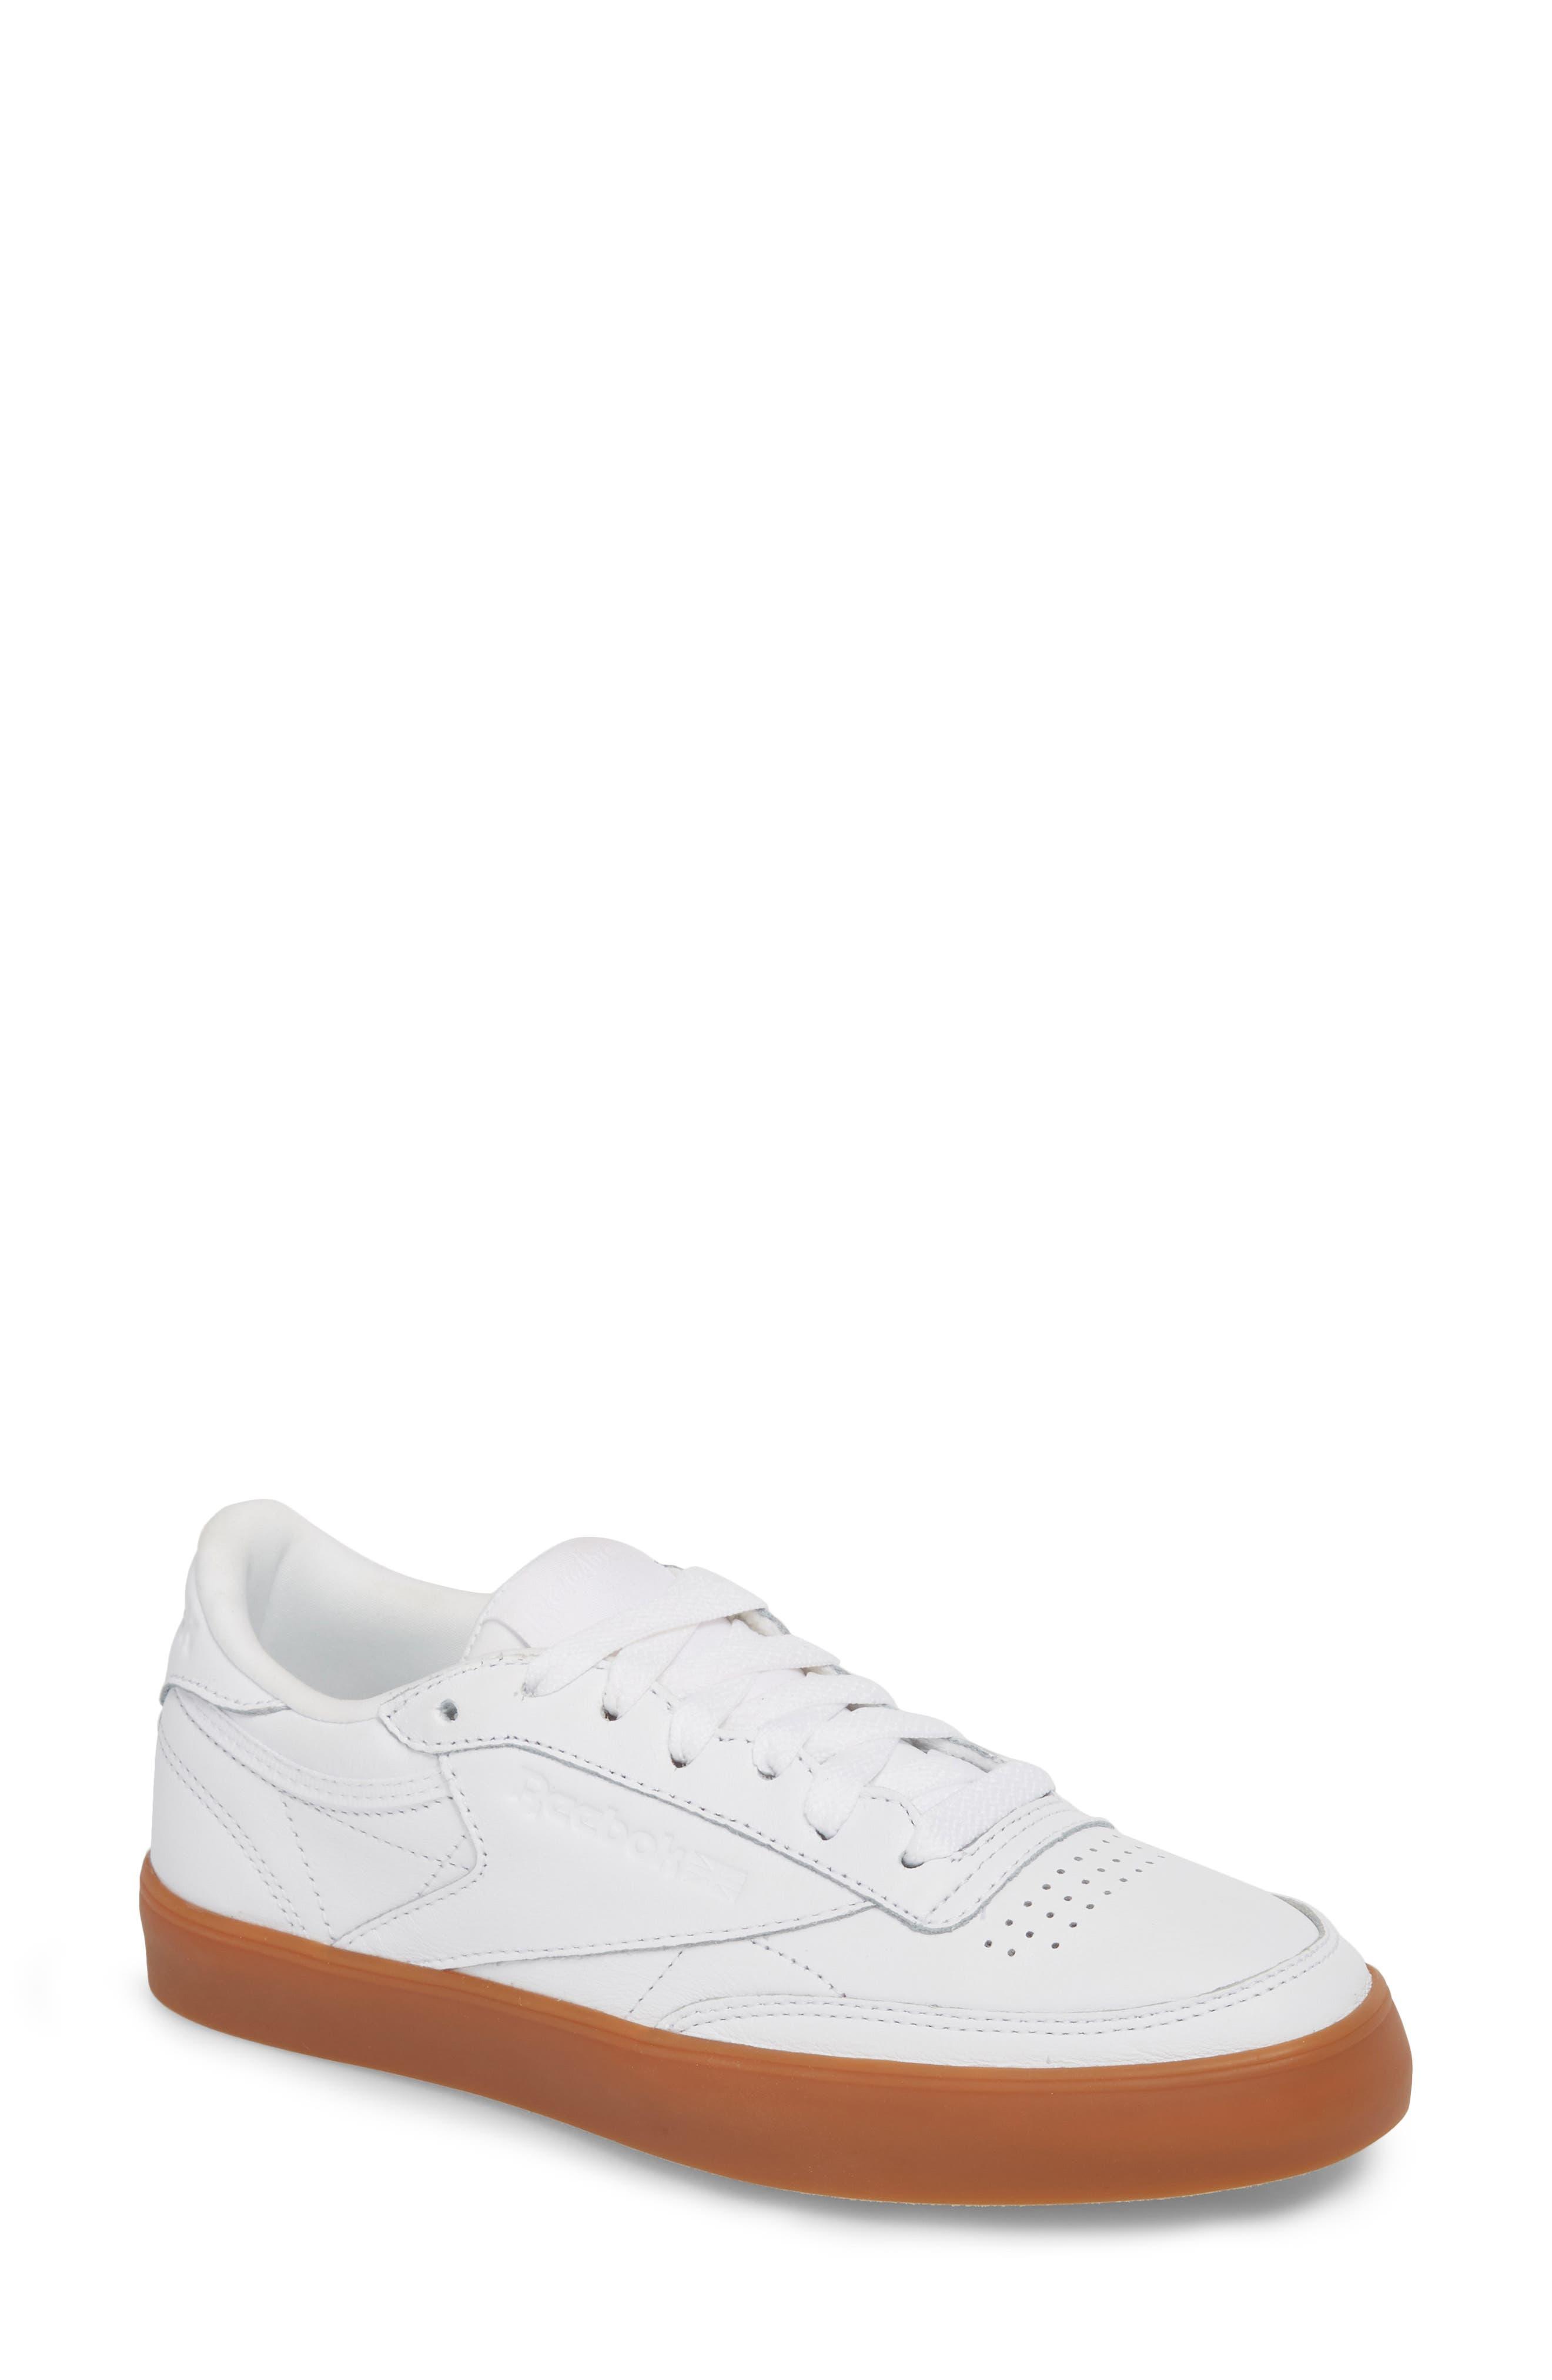 Alternate Image 1 Selected - Reebok Club C 85 Sneaker (Women)